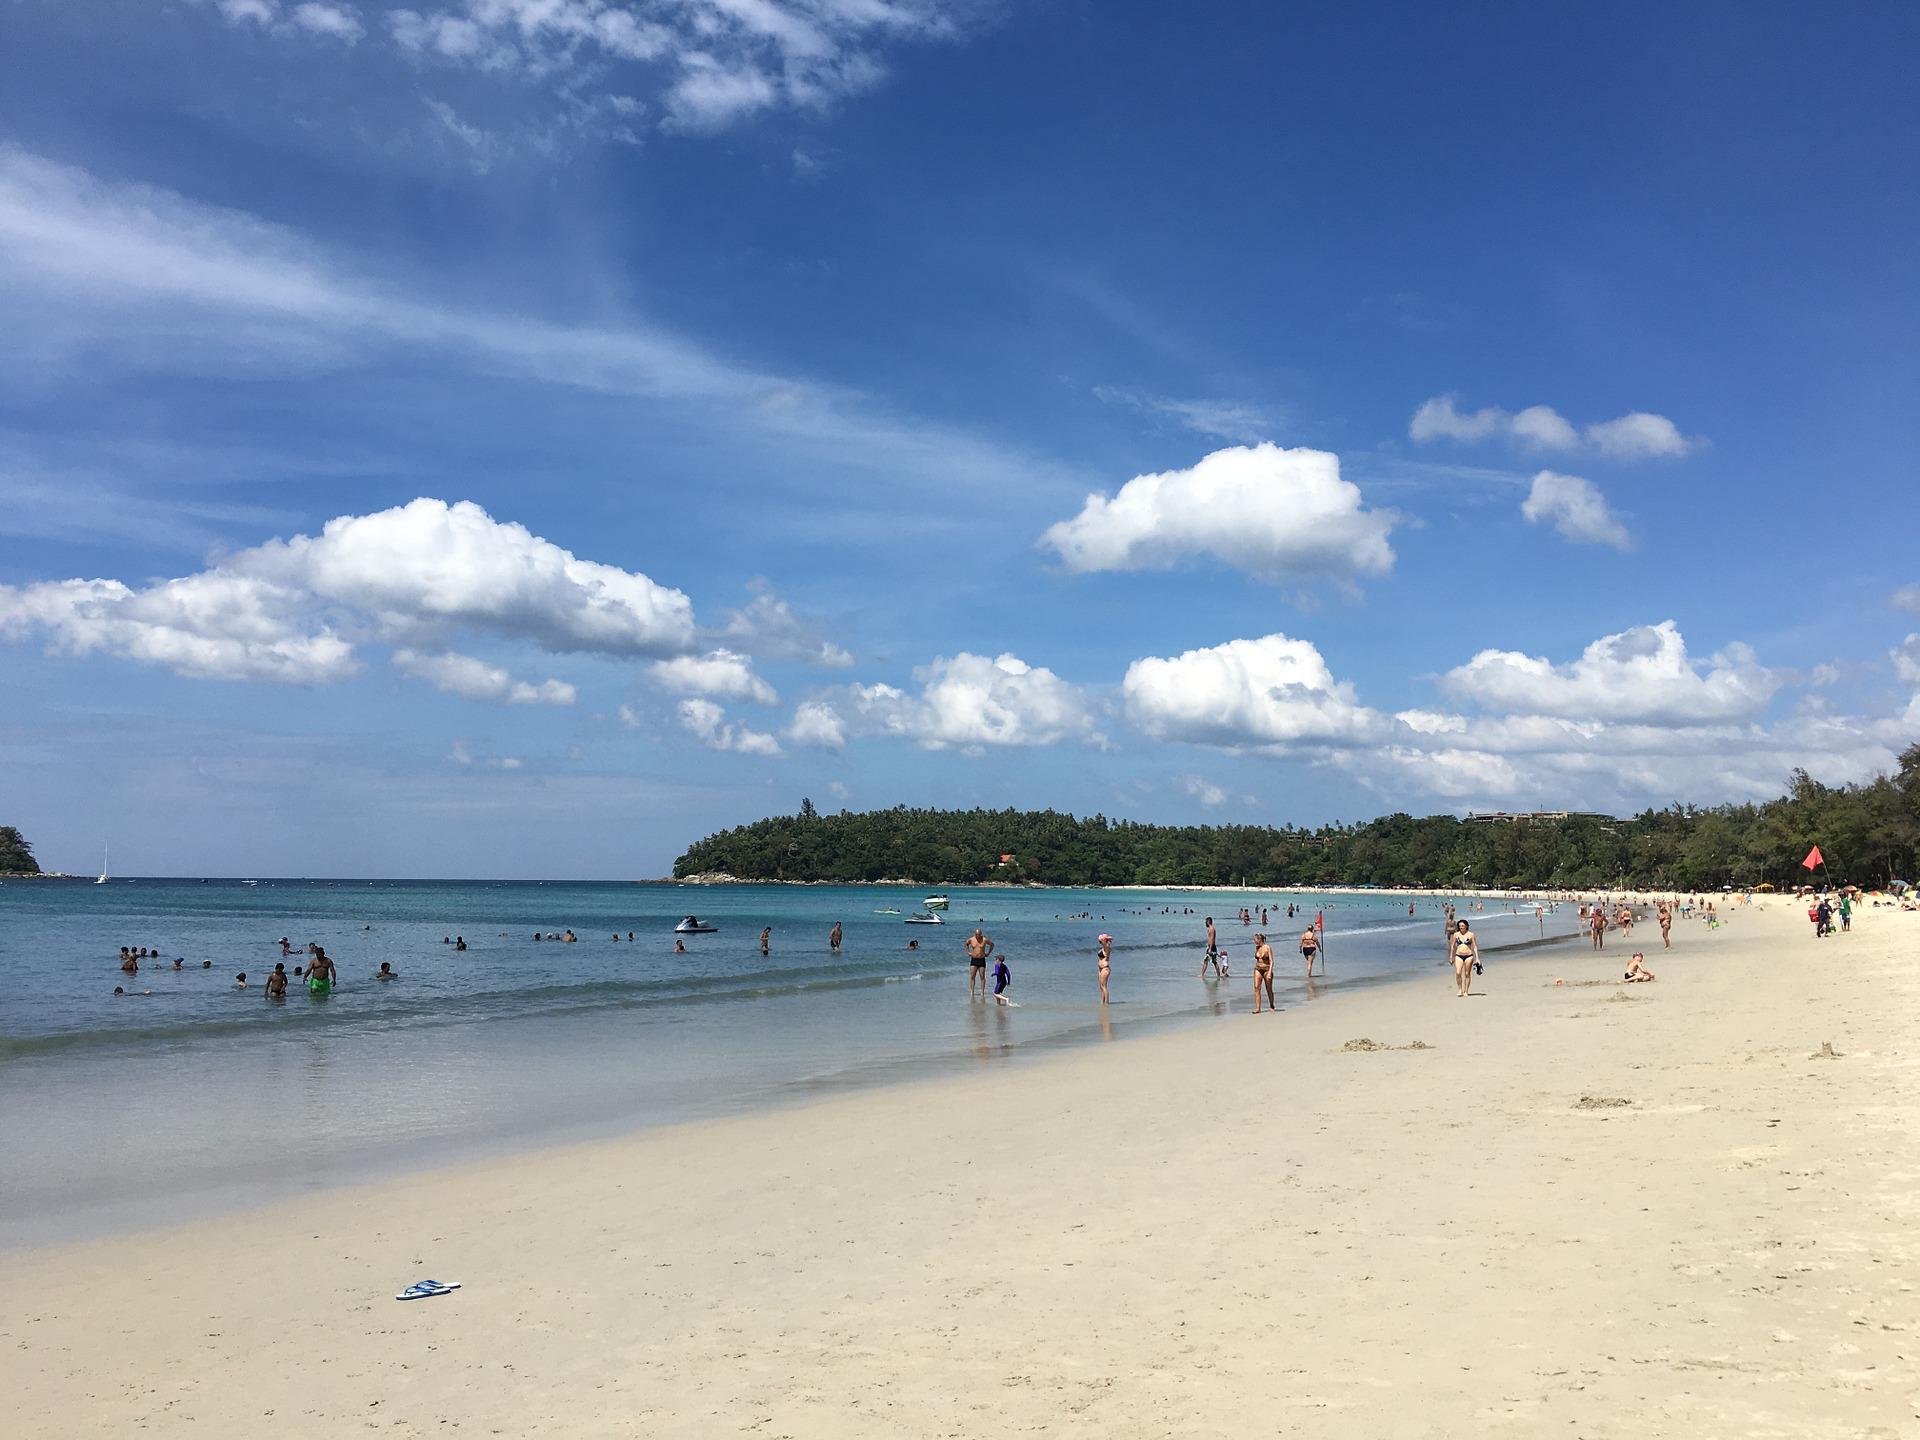 Patong Beach der beliebteste Strandabschnitt auf der Insel